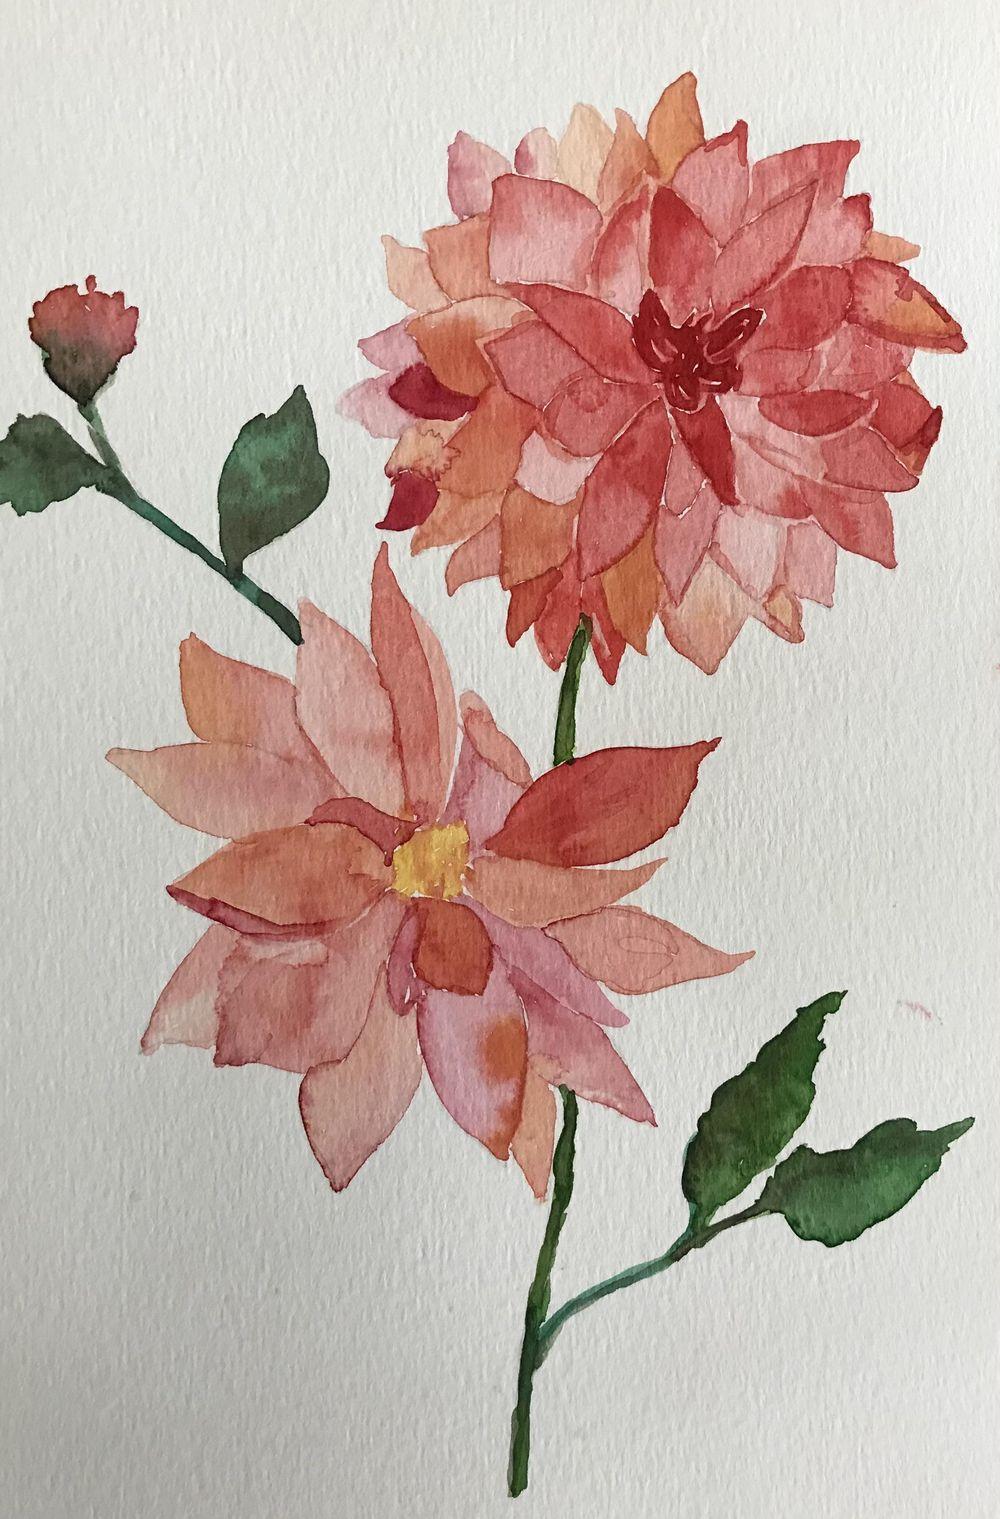 Watercolour dahlias - image 3 - student project